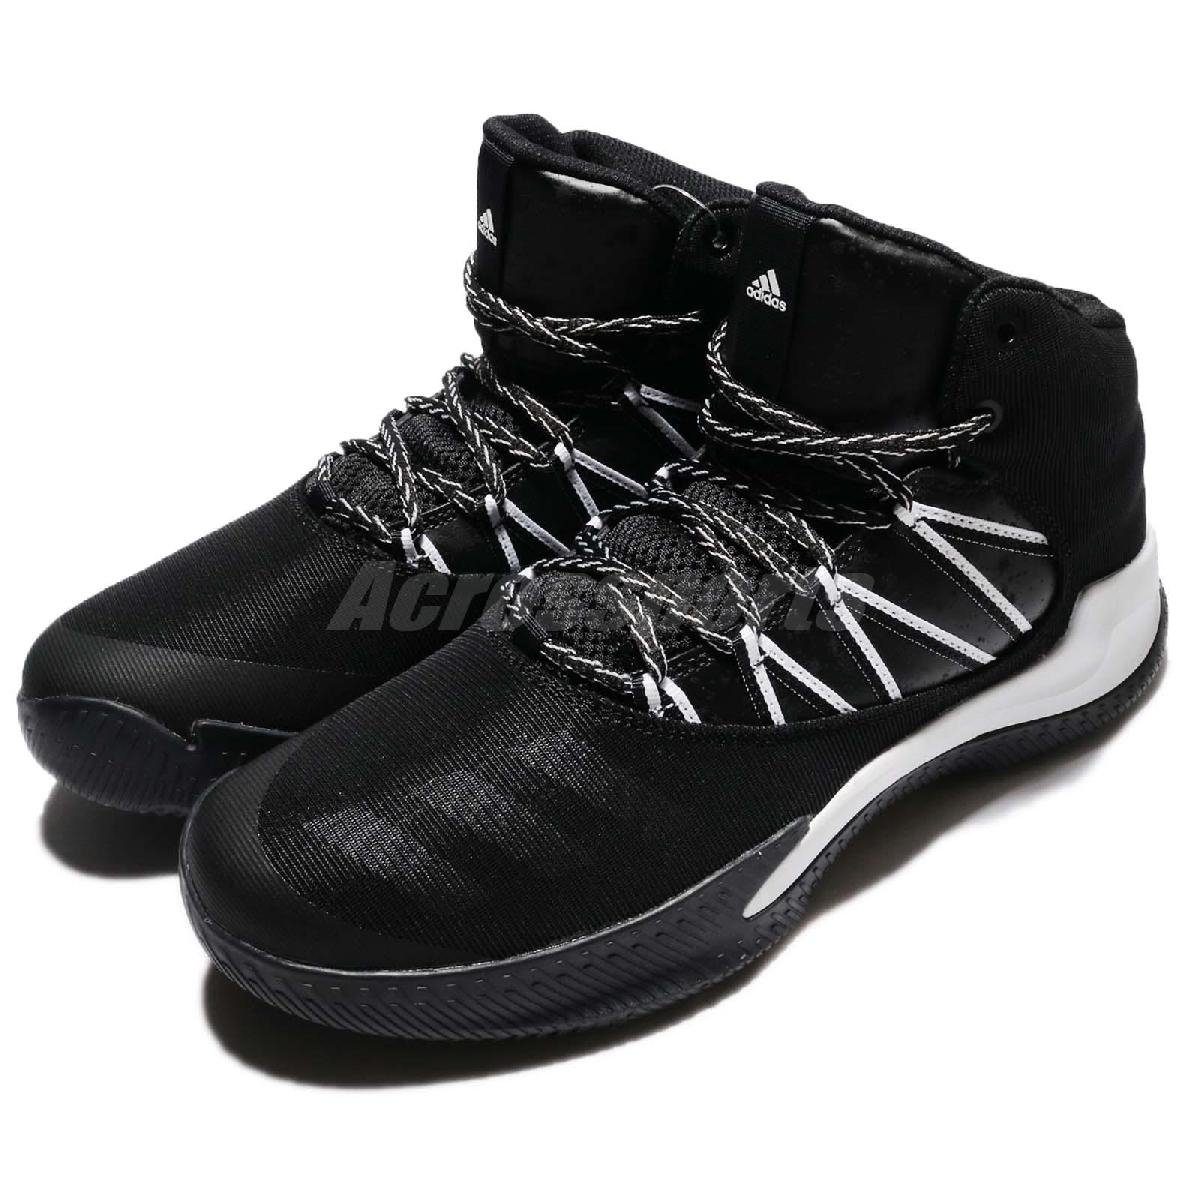 adidas籃球鞋Infiltrate黑白運動鞋戶外球鞋基本款高筒男鞋PUMP306 BW1359